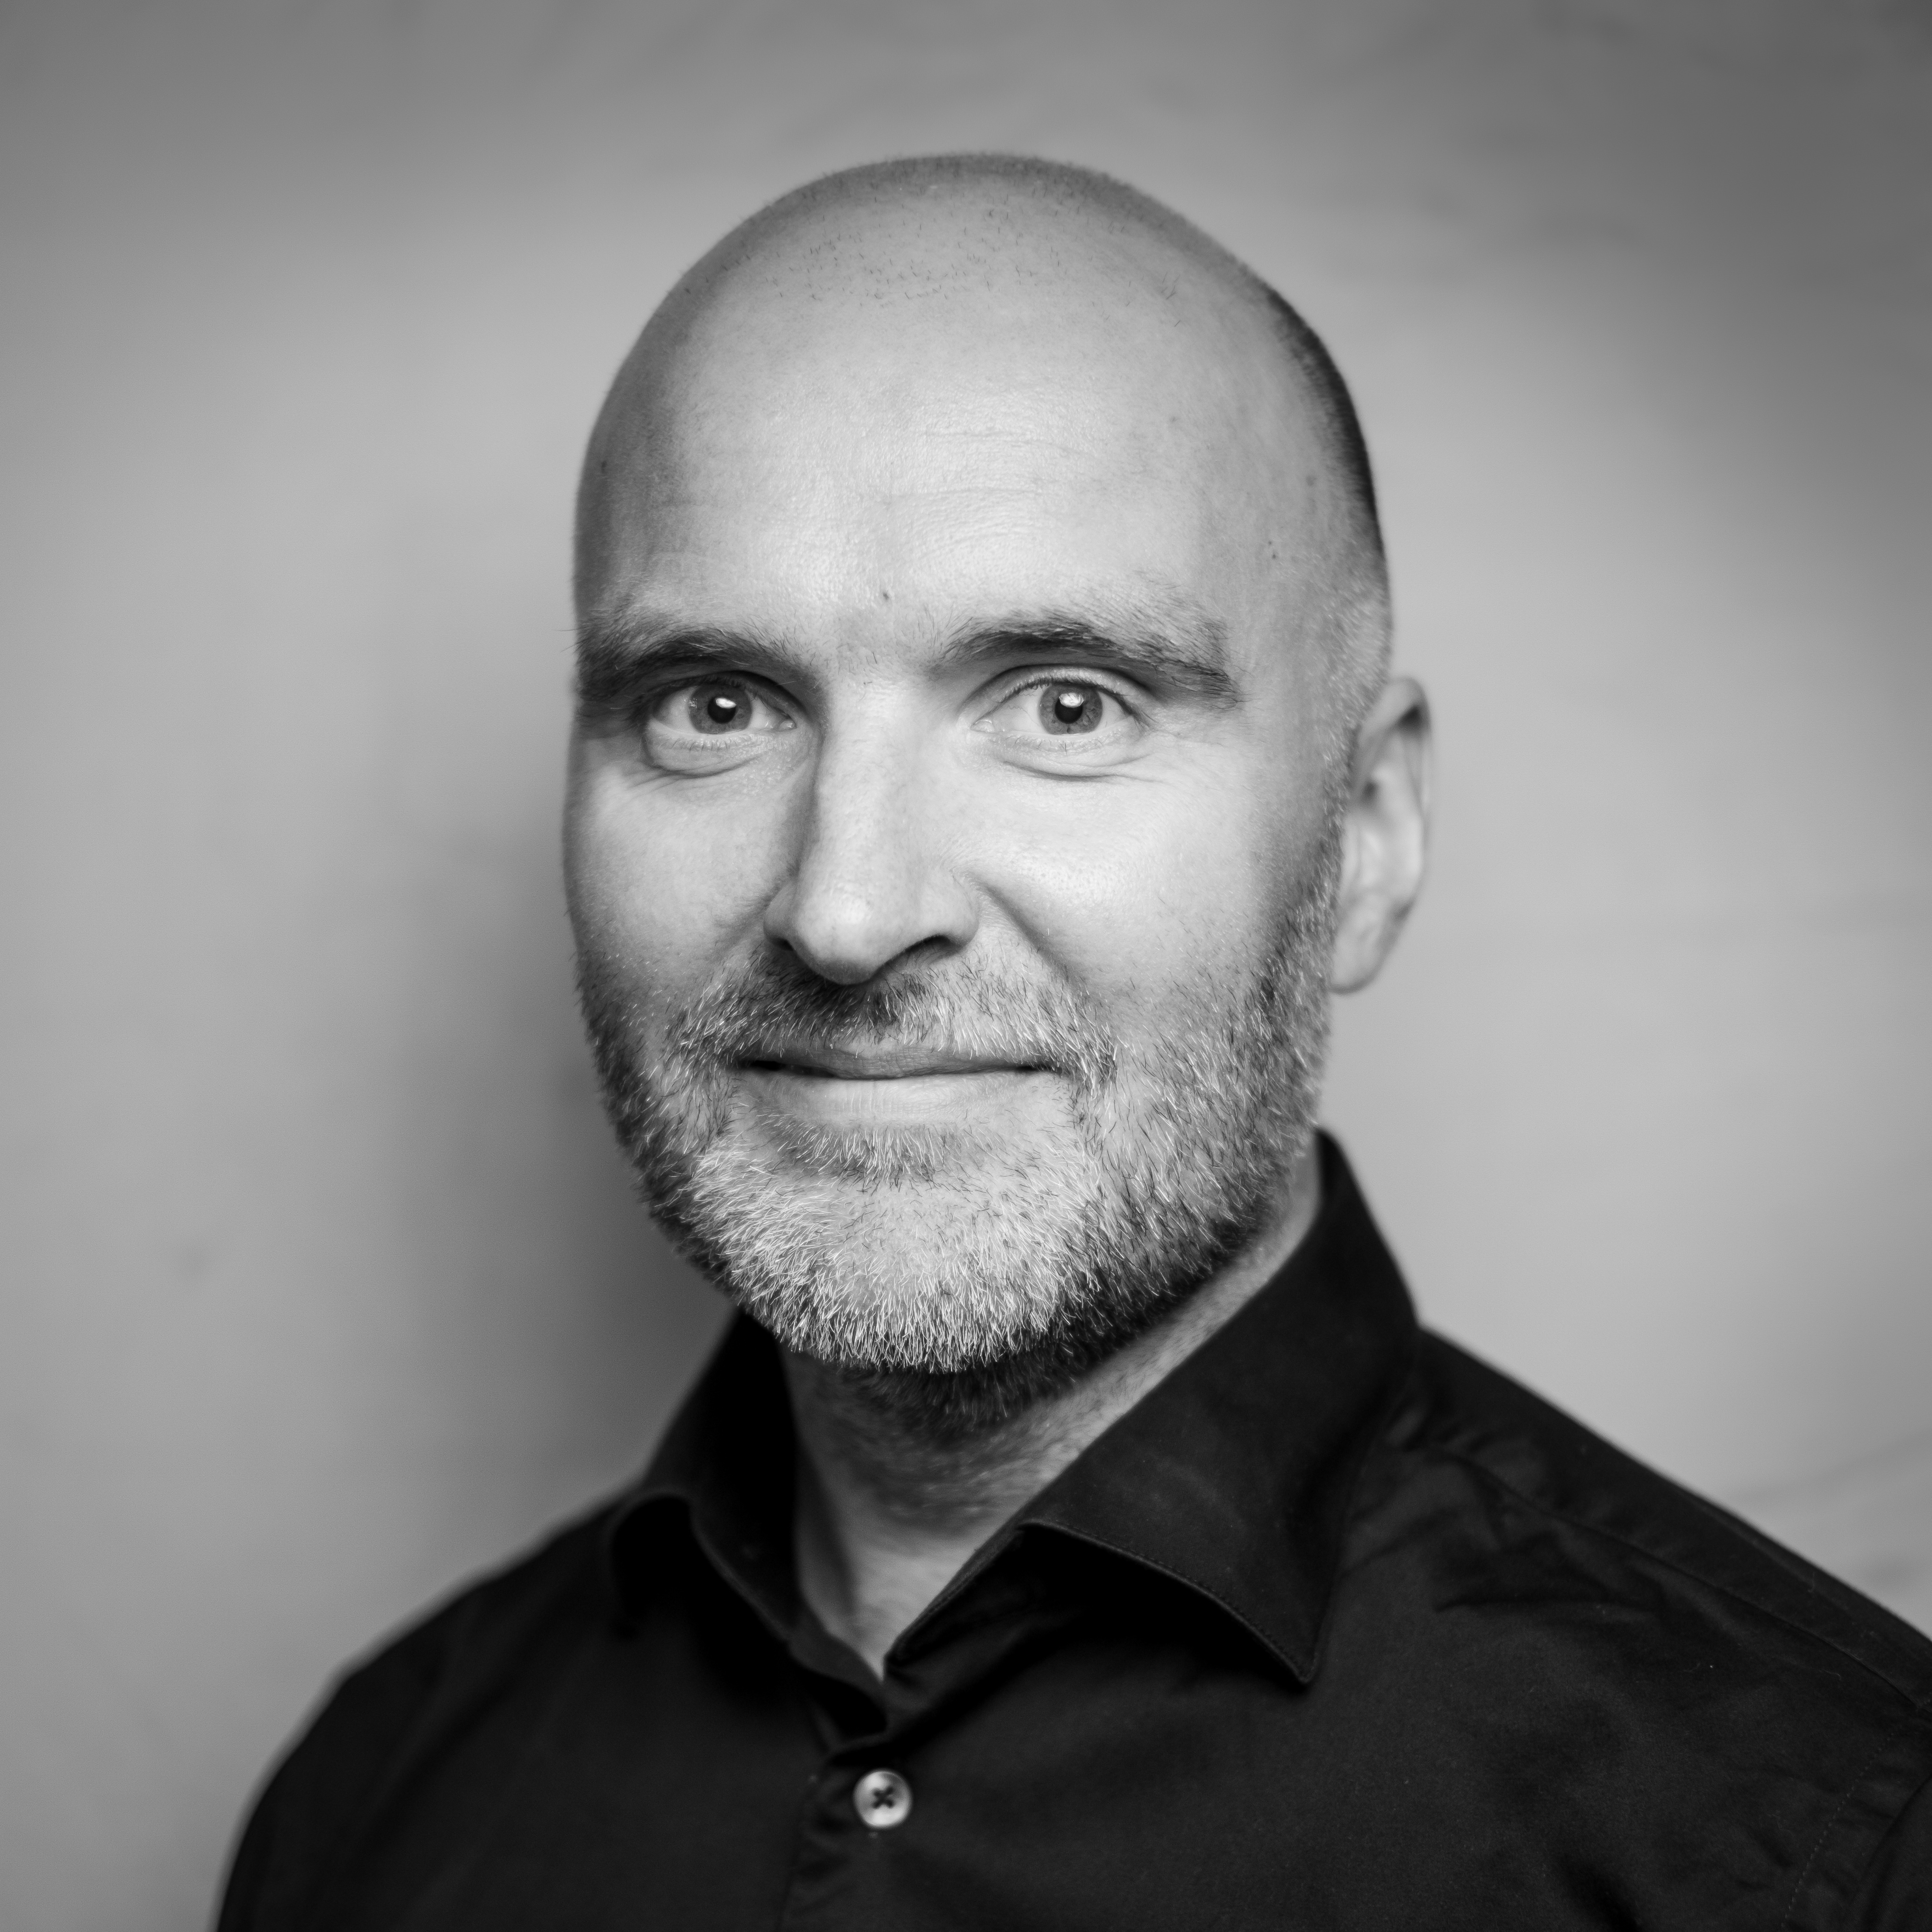 Tenor i Solistkoret, Håvard Gravdal